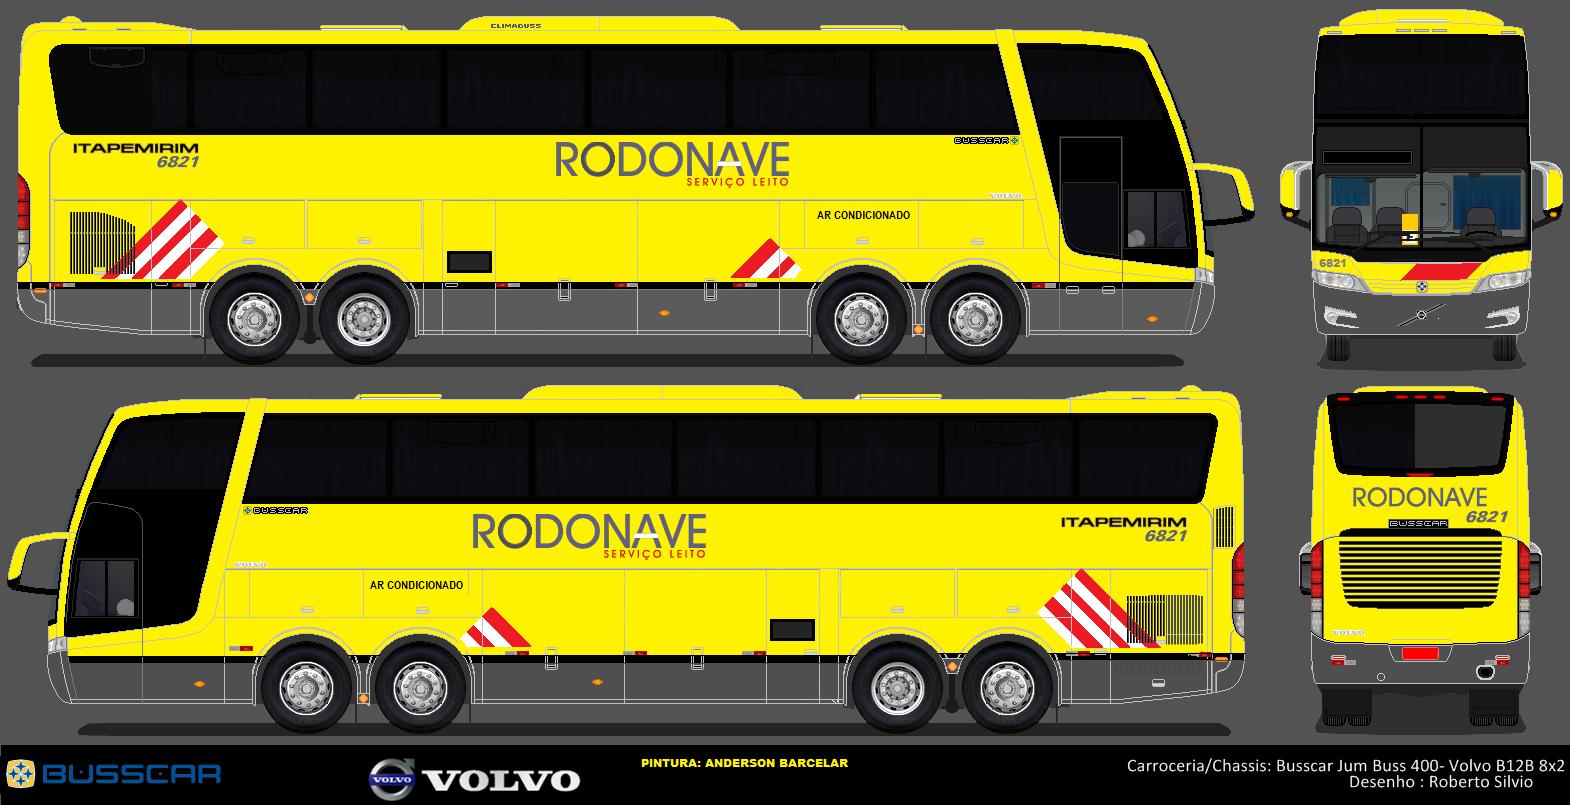 Busscar Jum Buss 400 Itapemirim Desenho Onibus Brasil